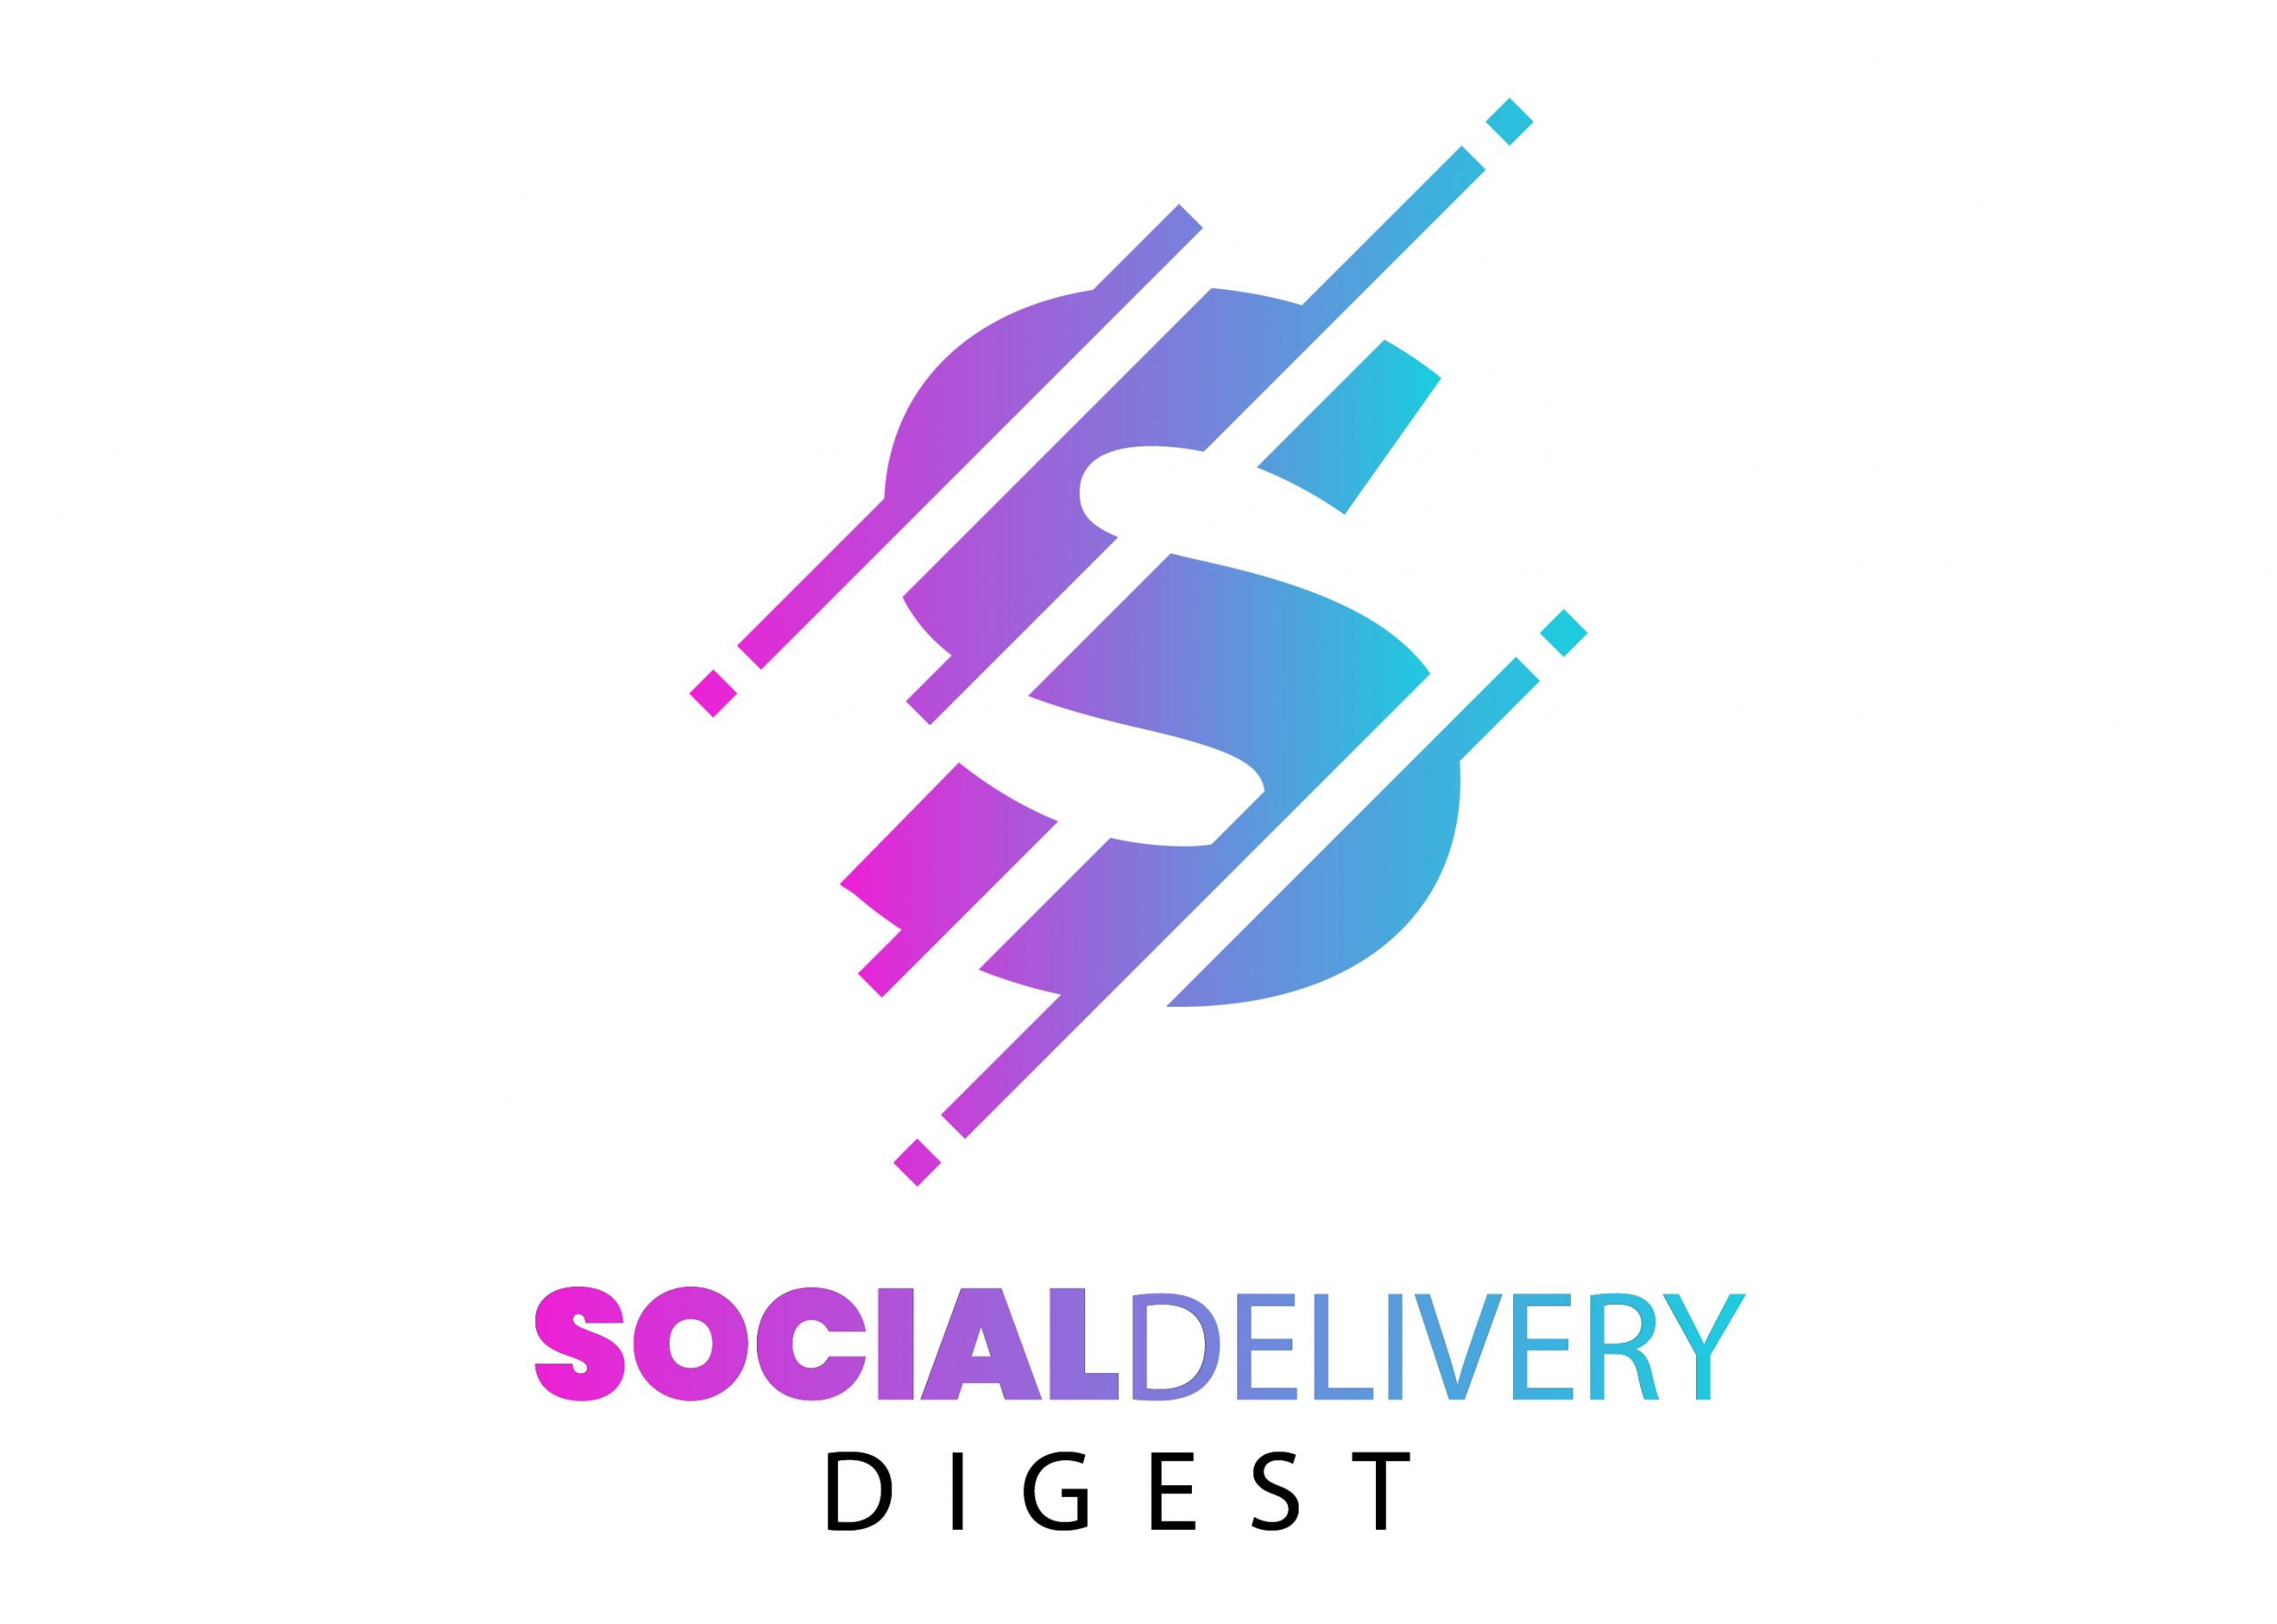 professional logo design services - Online Design Club